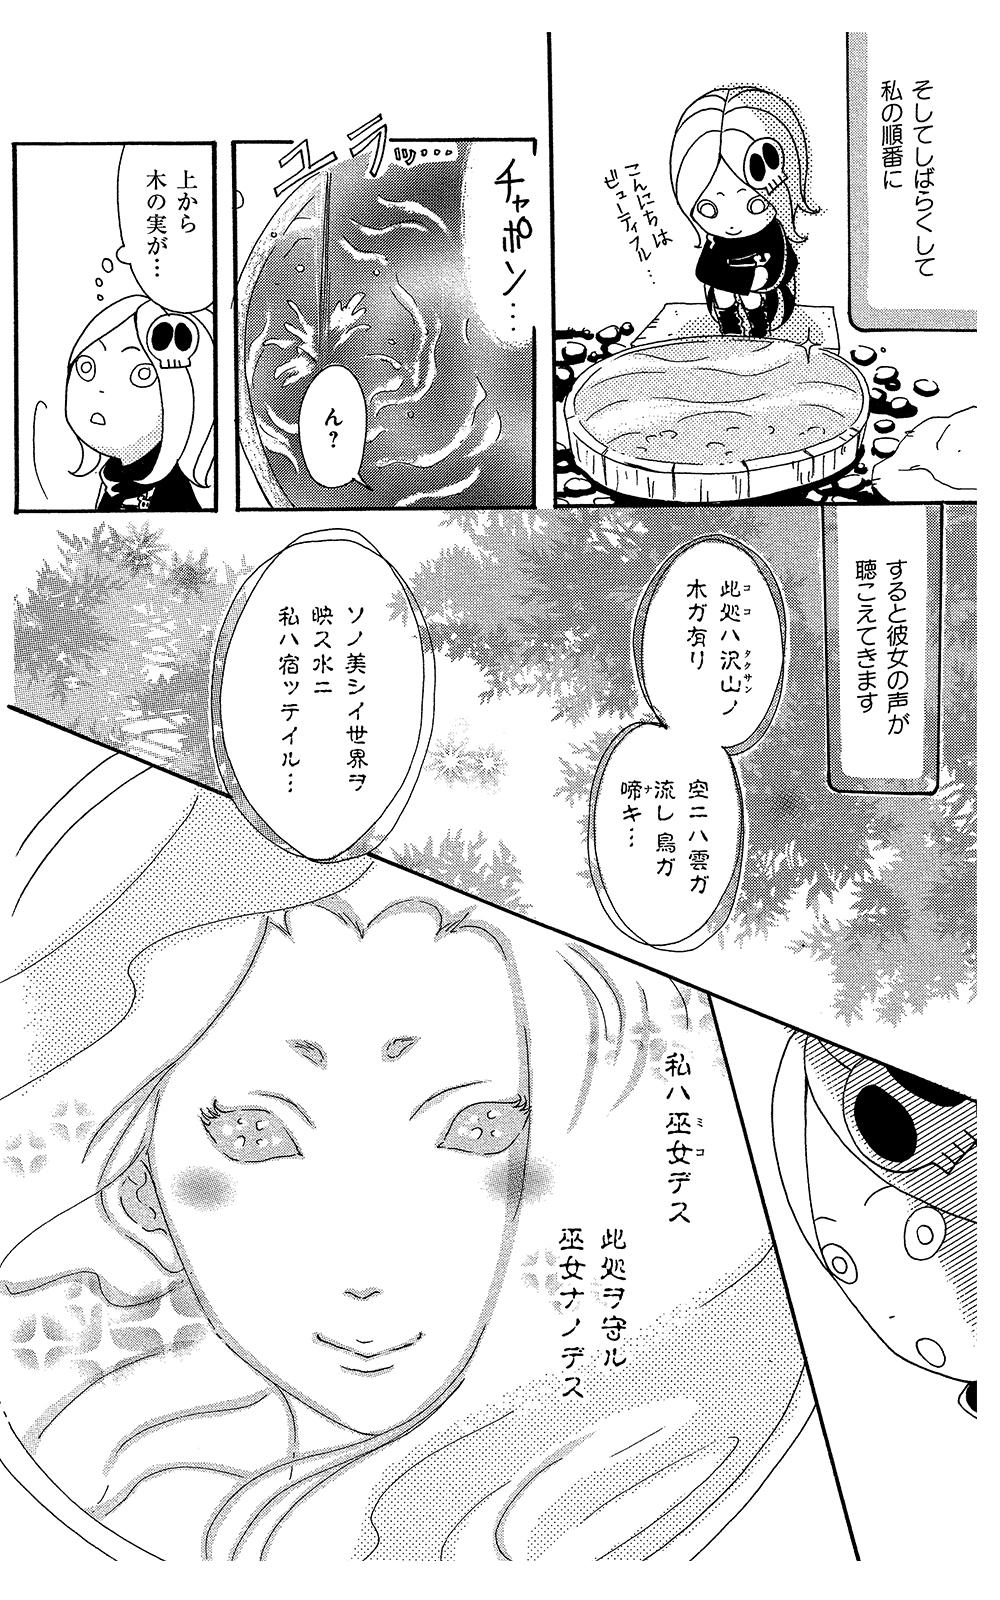 スピ☆散歩 第2話「清正井と明治神宮」②spsanp04-01.jpg